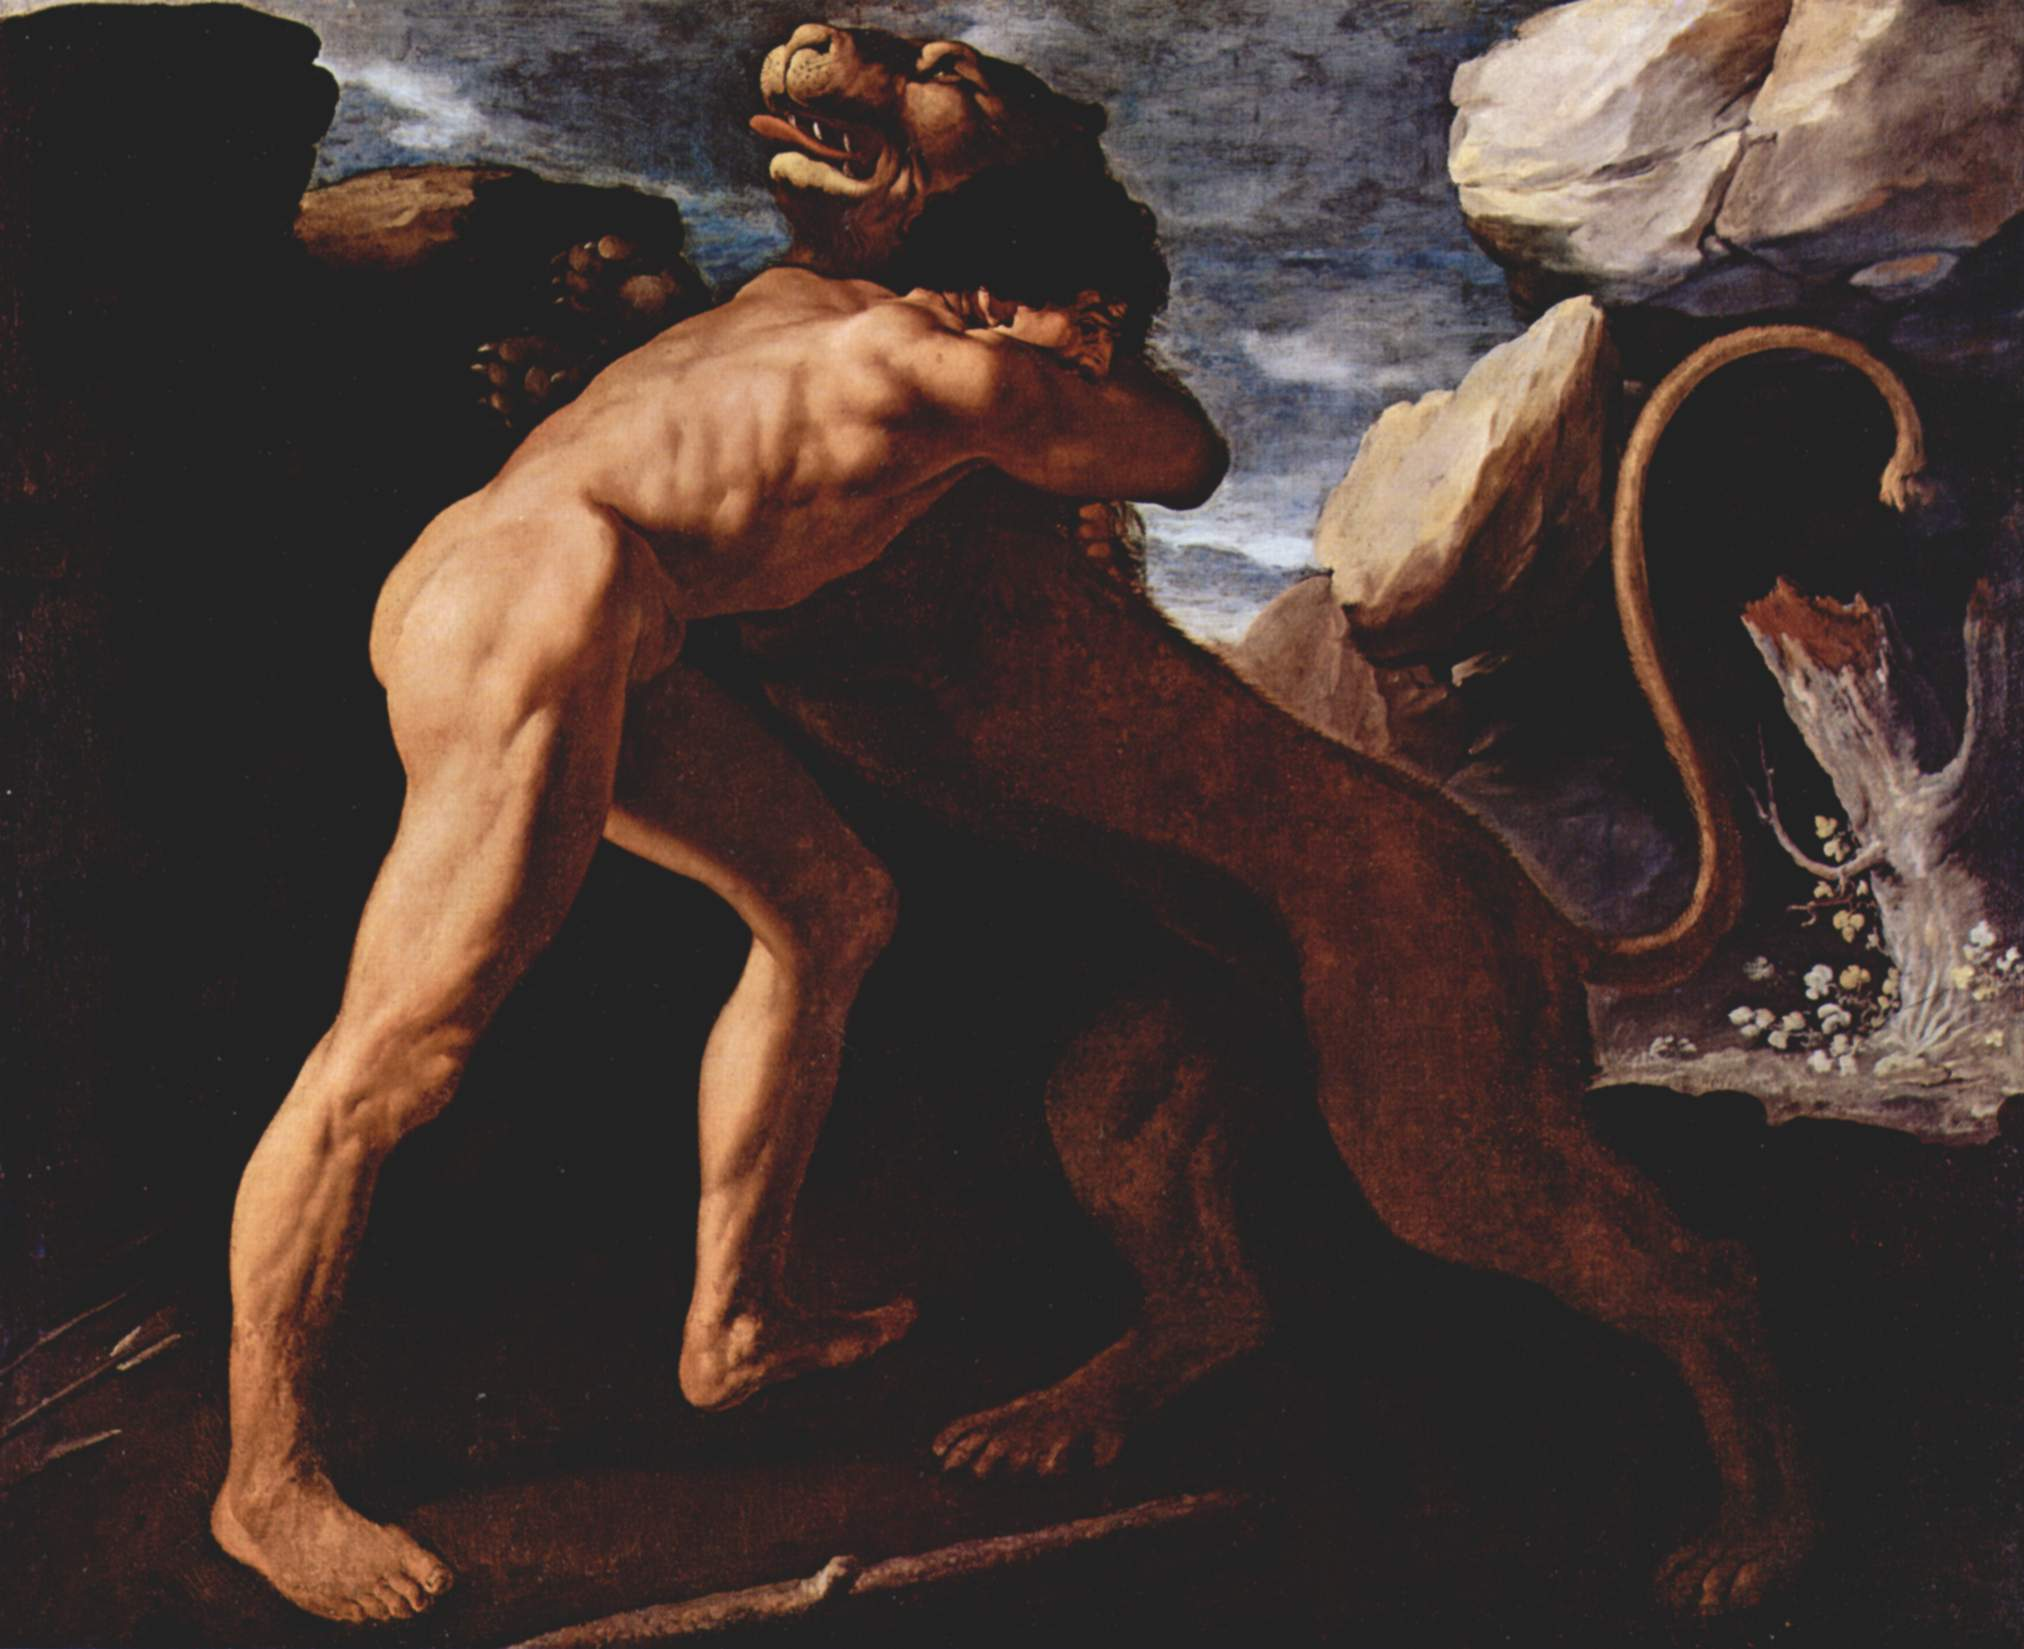 Hercules-Figthing-with-the-Nemean-Lion-Francisco-de-Zurbaran-1634.jpg